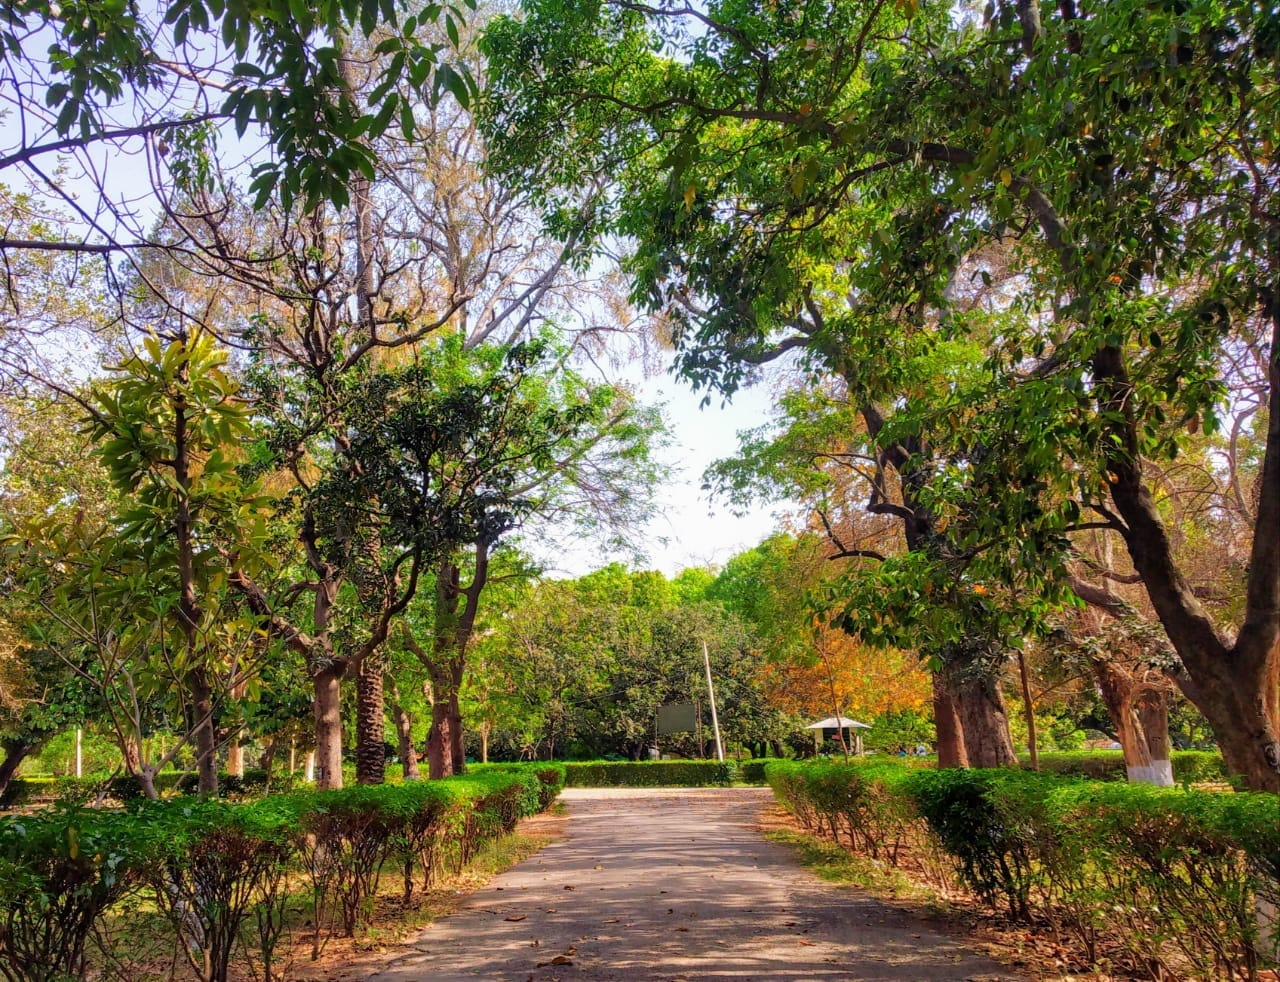 Attraction Tourist Place In Patiala-Baradari Garden